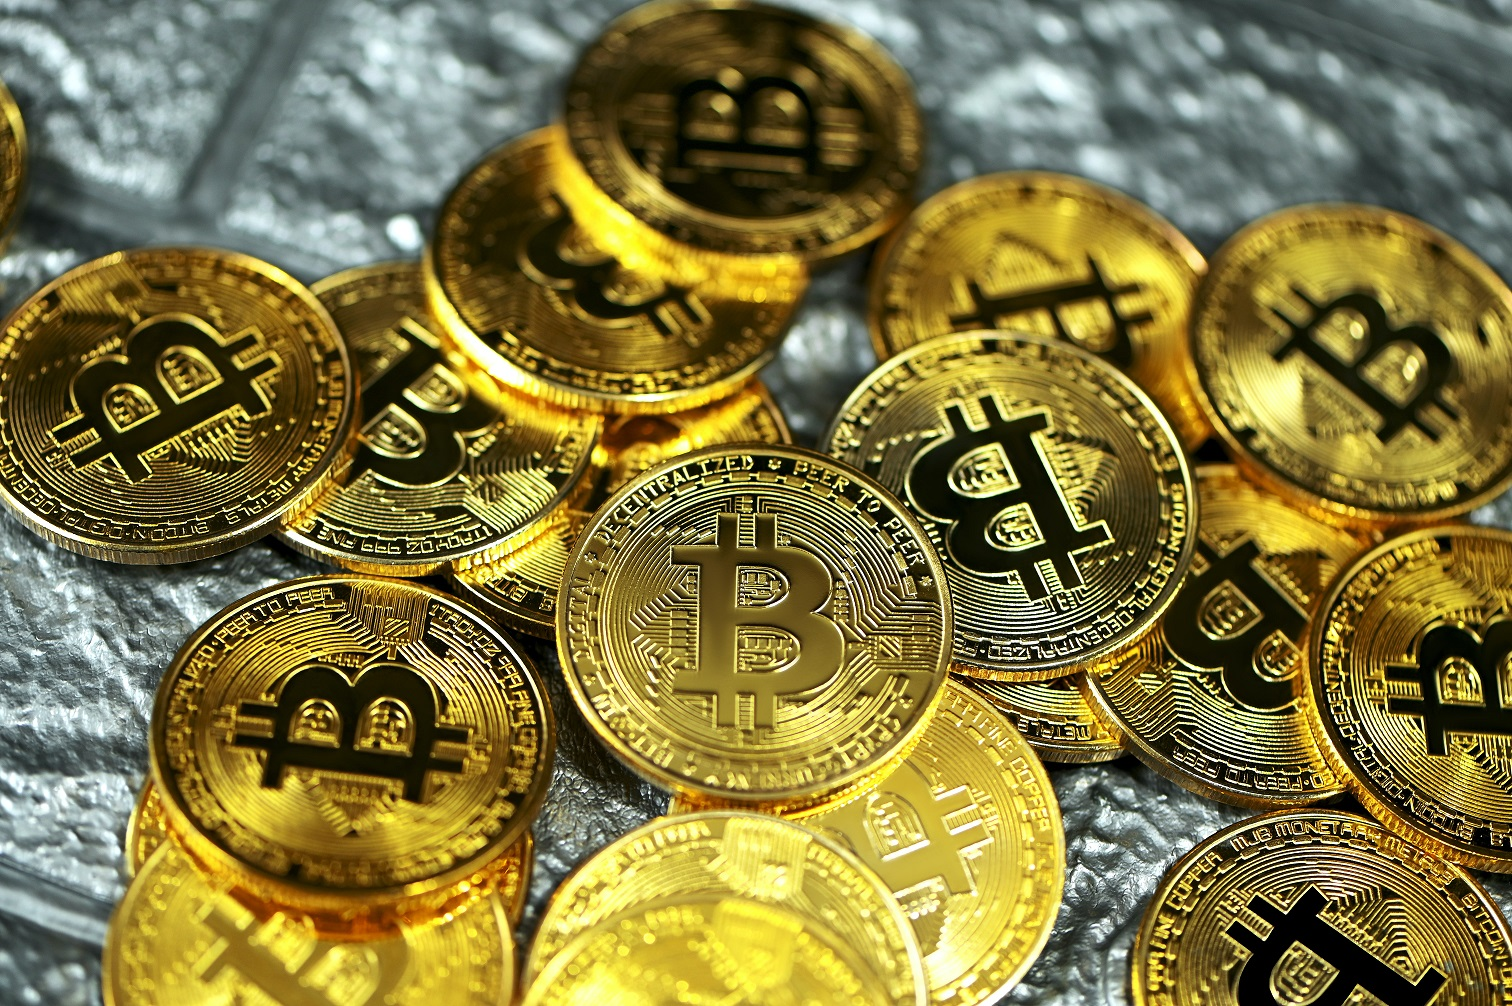 Diamond Hands: Short-Term Bitcoin Supply Reaches Historical Lows